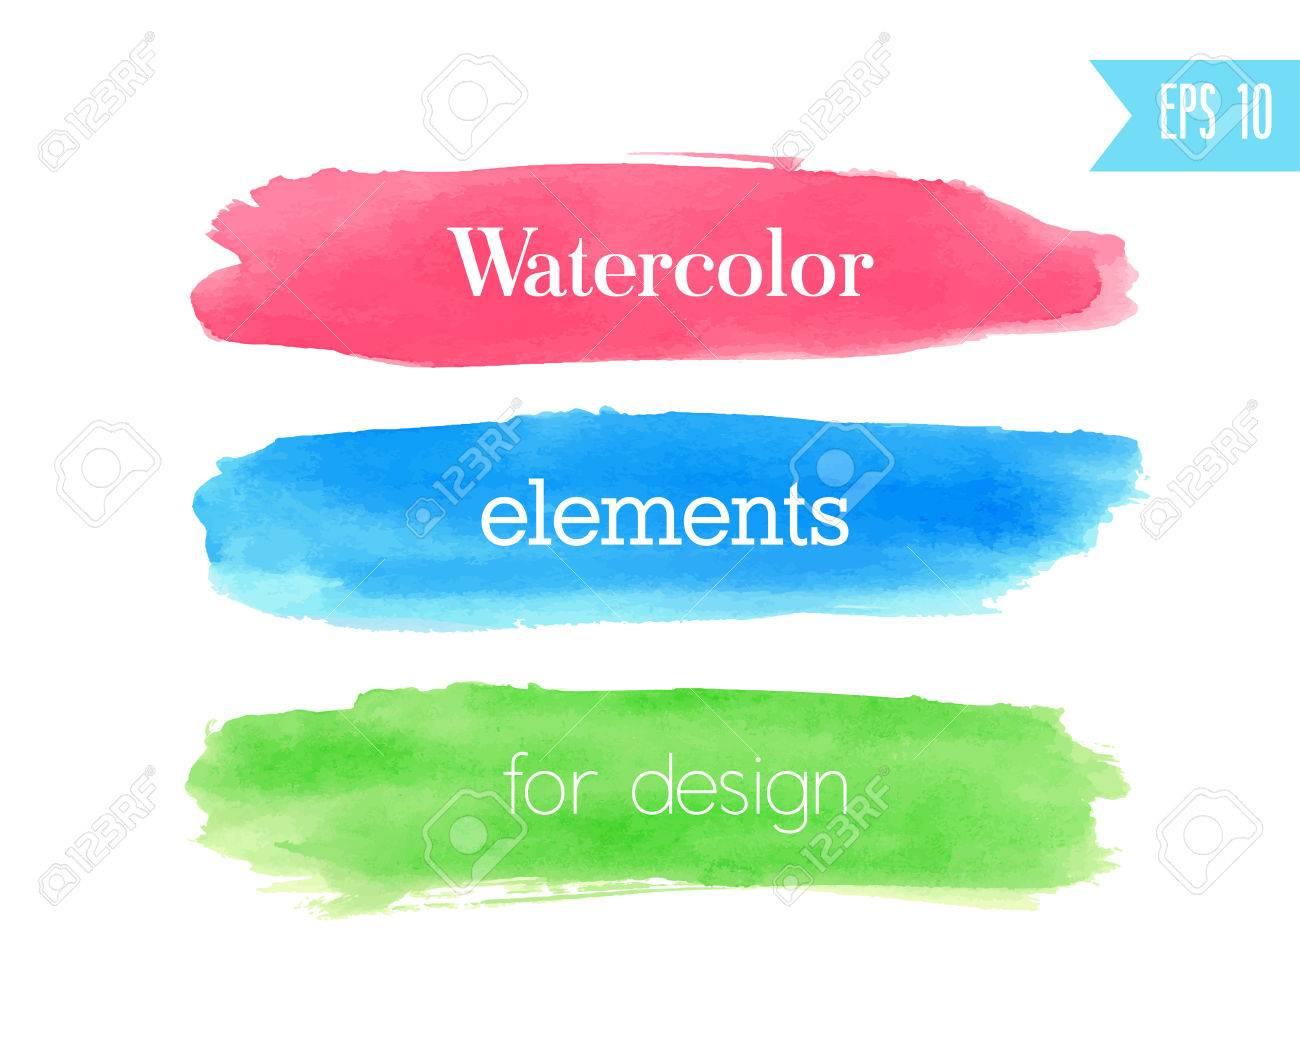 Watercolor brush stroke. Vector illustration. - 34331372